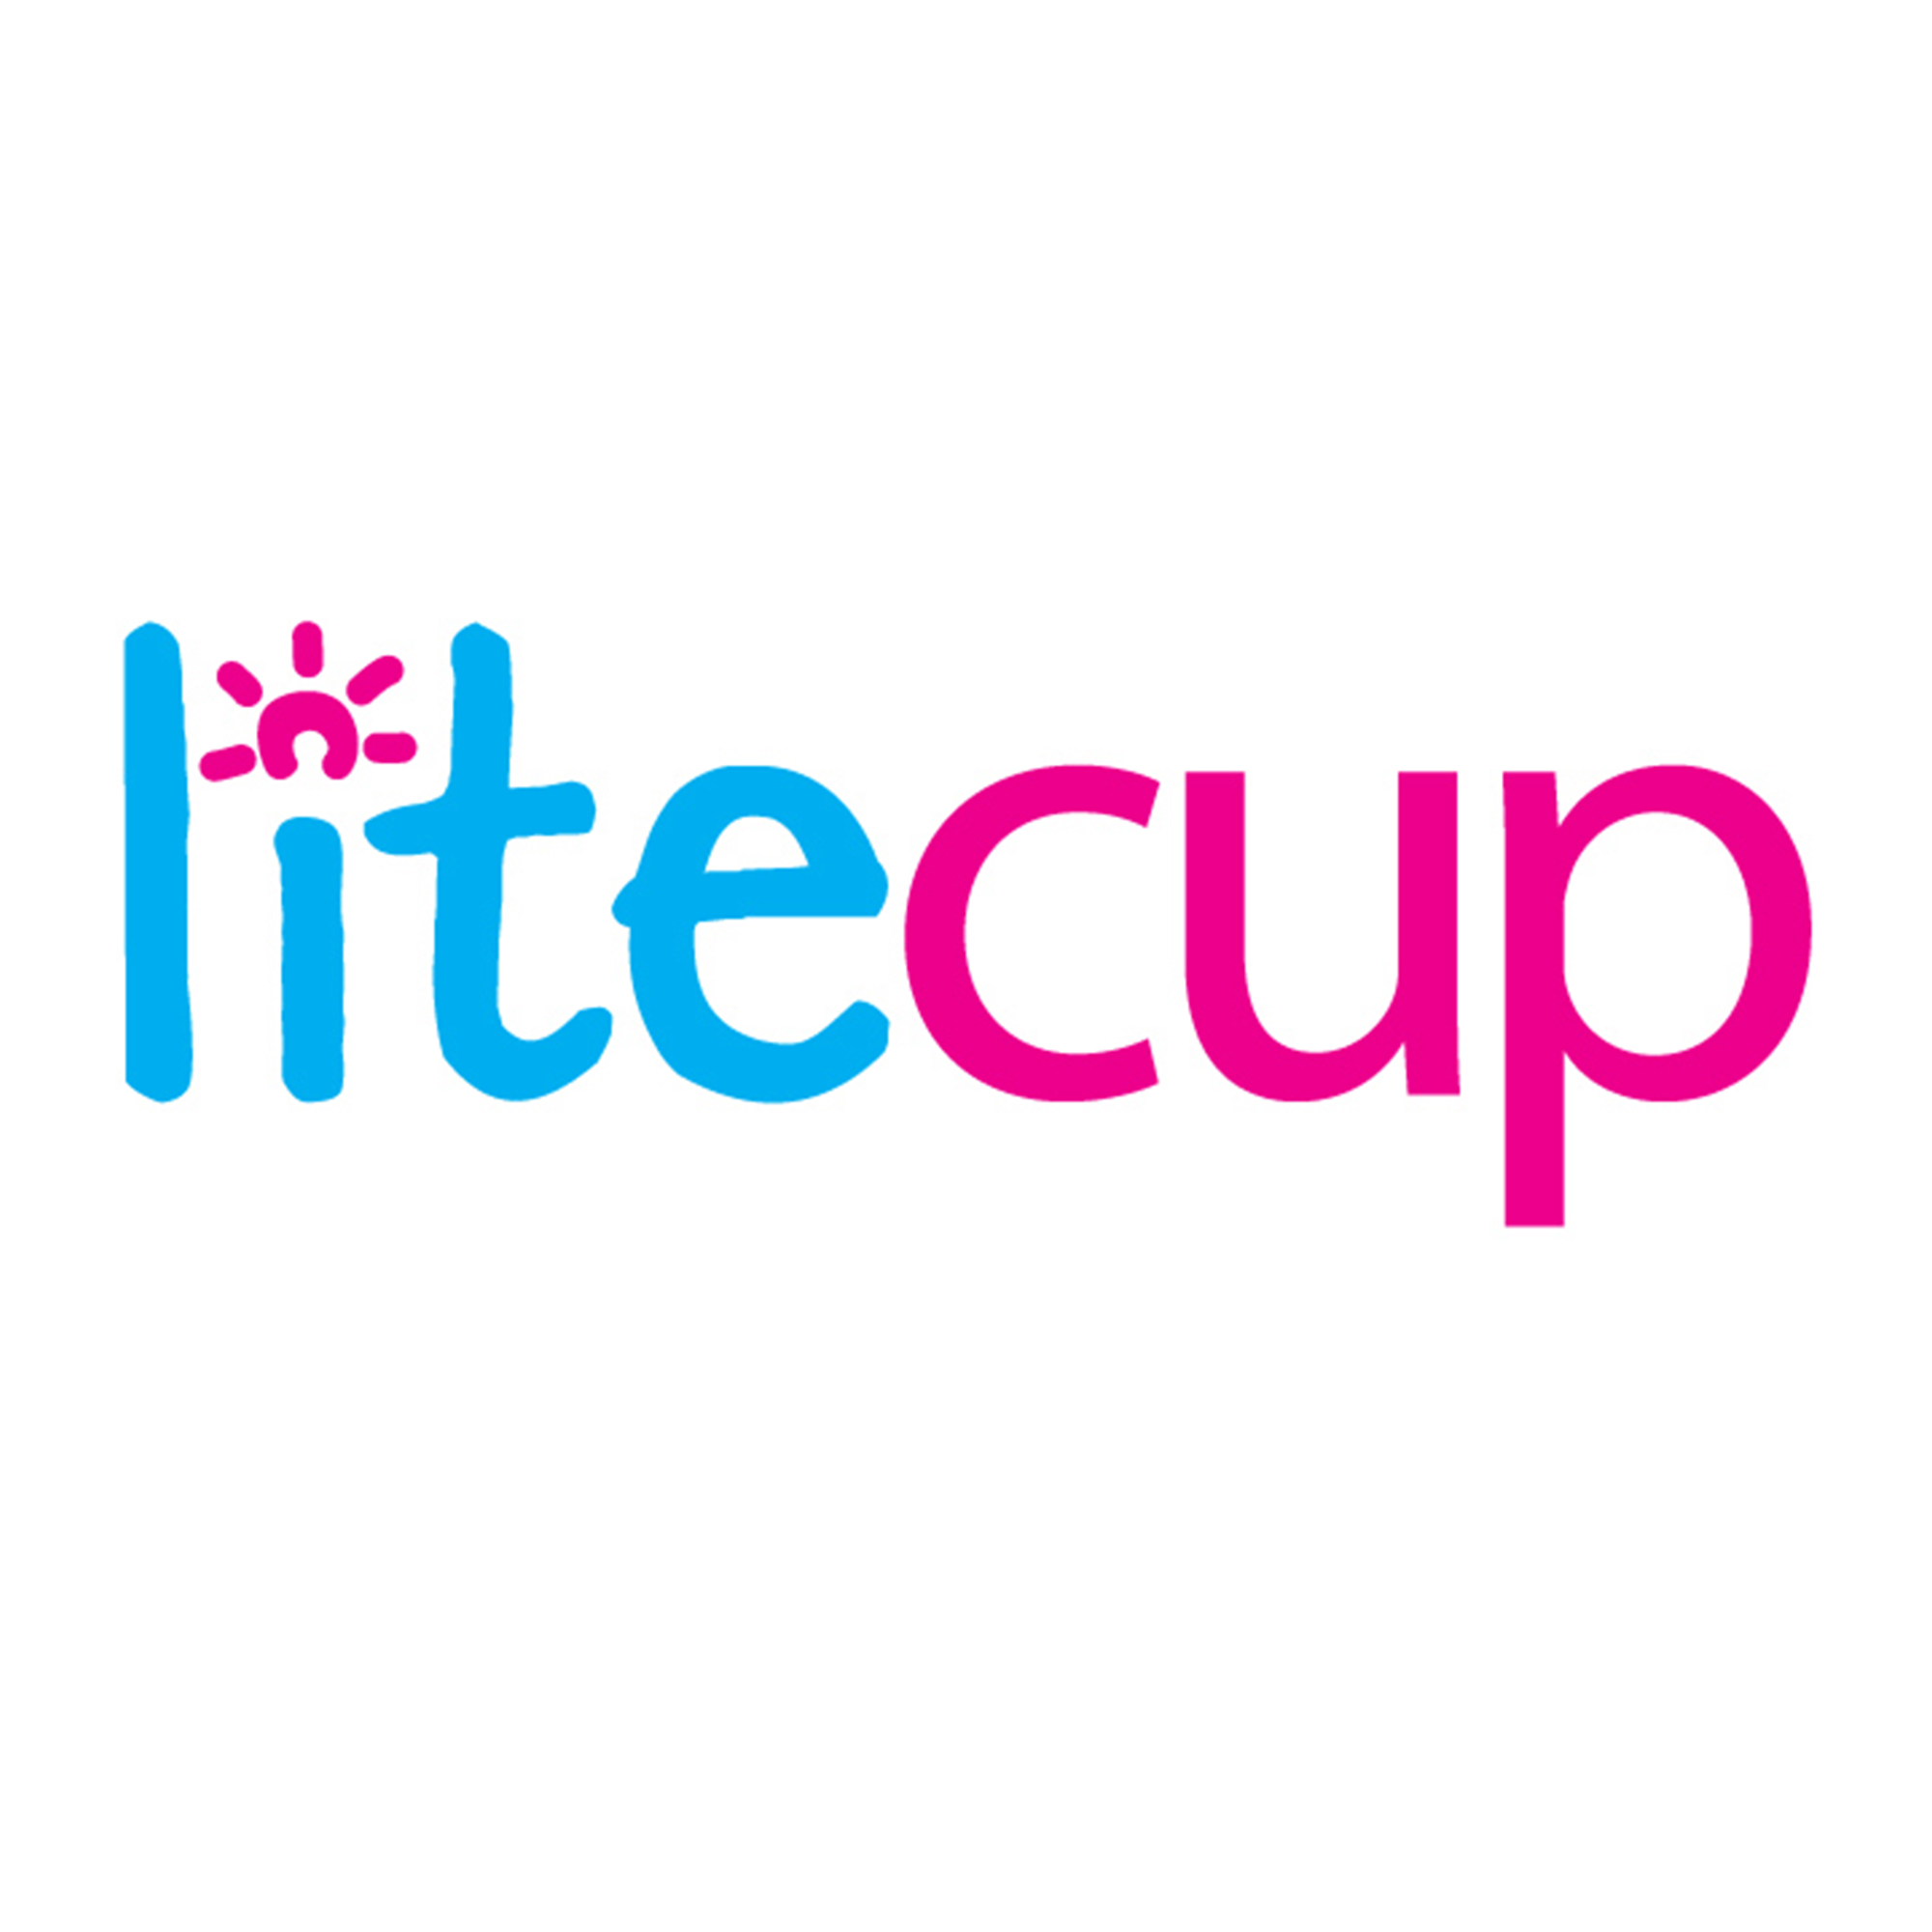 Little-Litecup-Sippy-Cup-Nightlight-Non-Spill-360-Drinking-Edge-220ml thumbnail 7